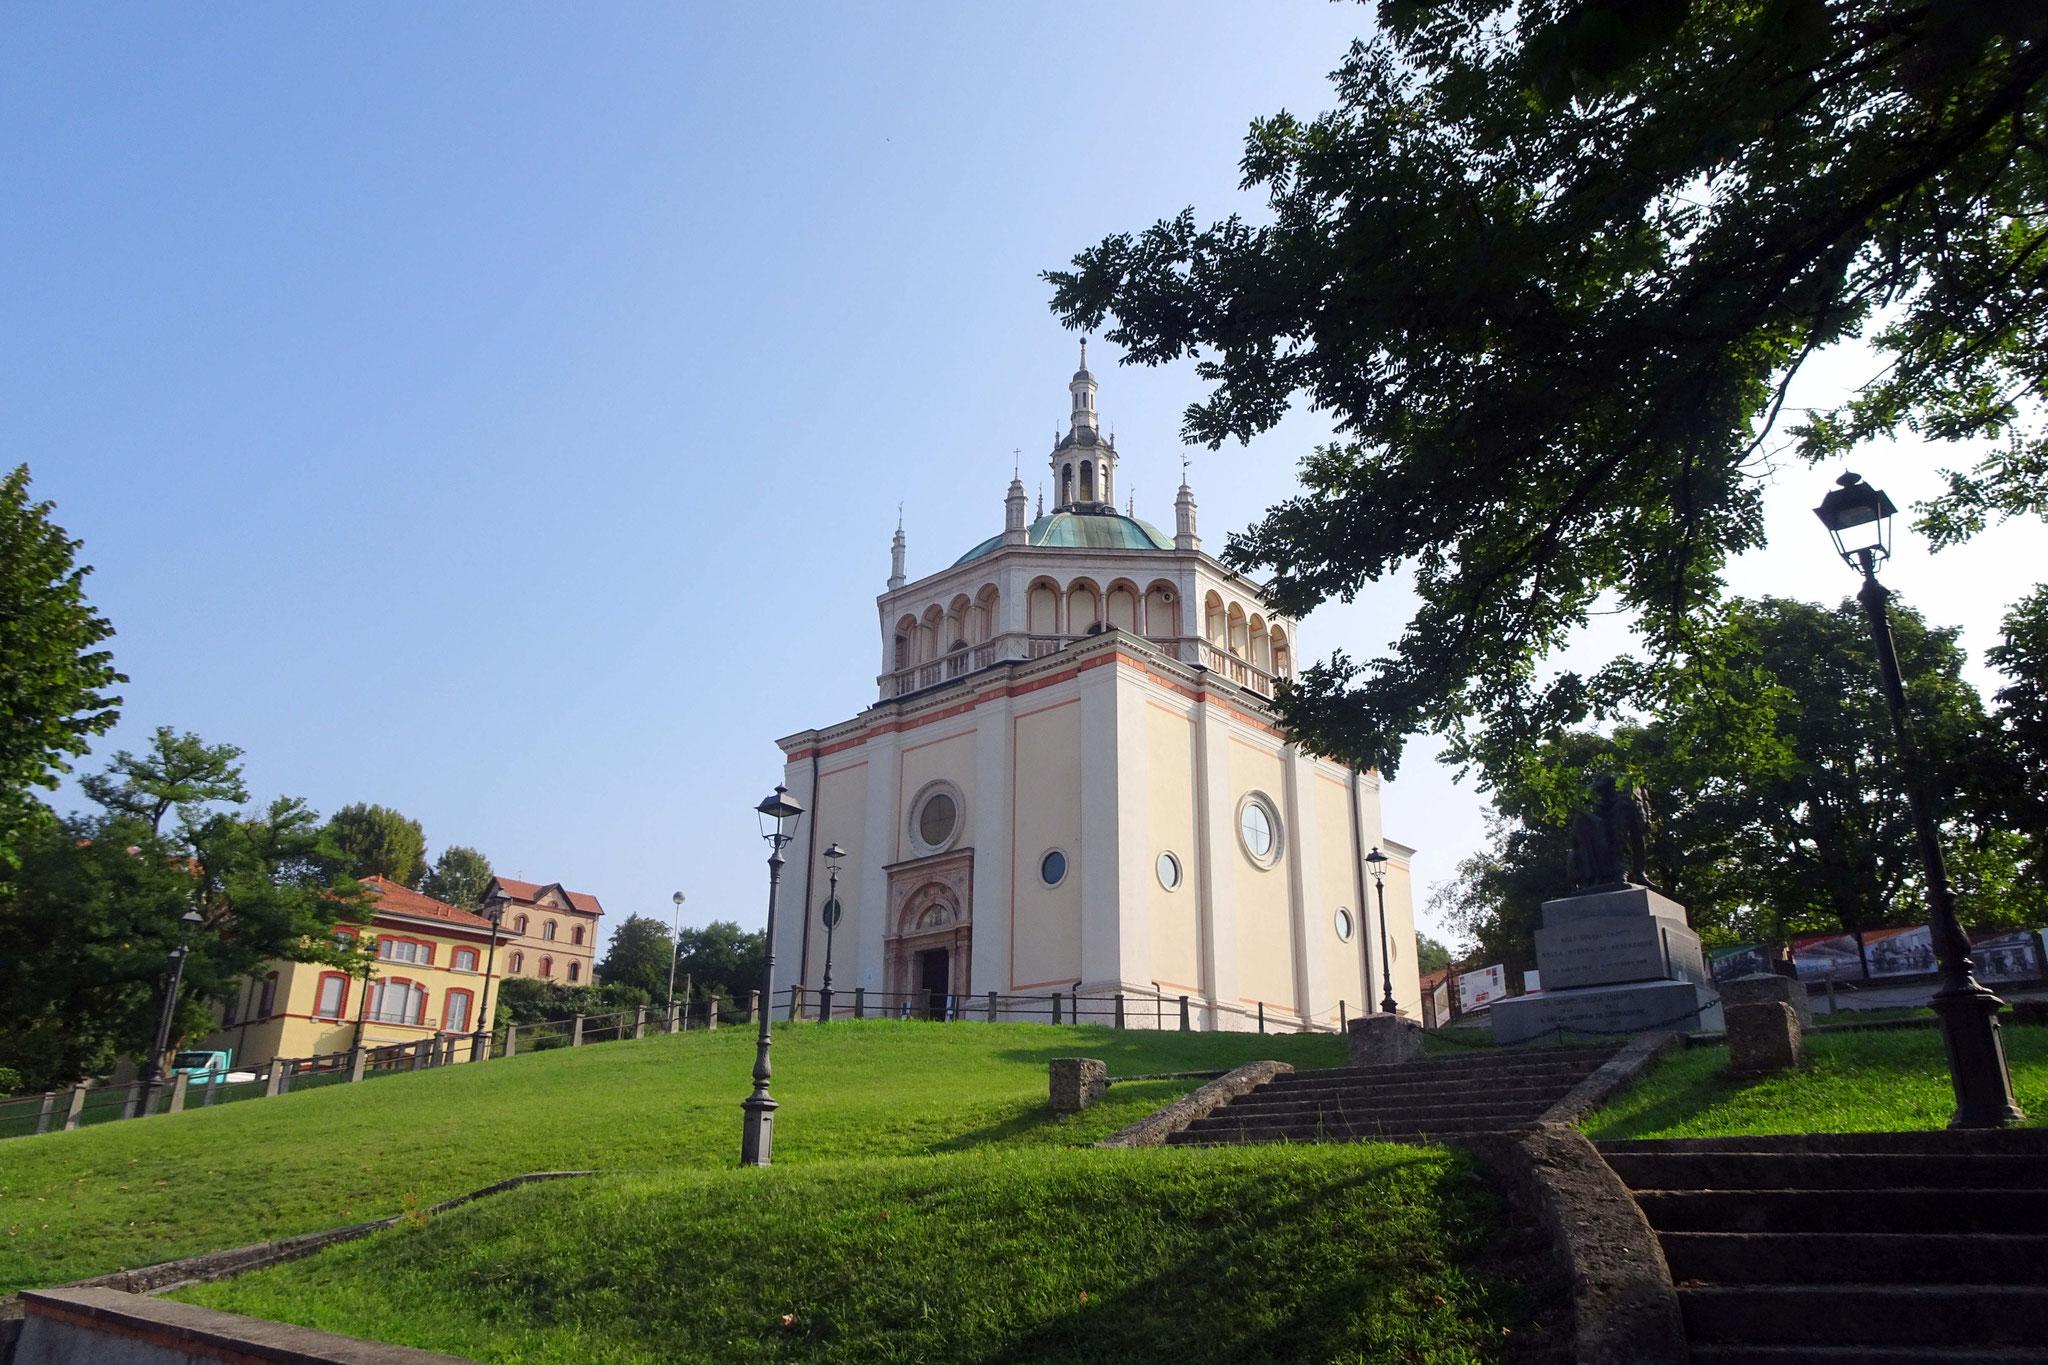 Eglise de Crespi d'Adda